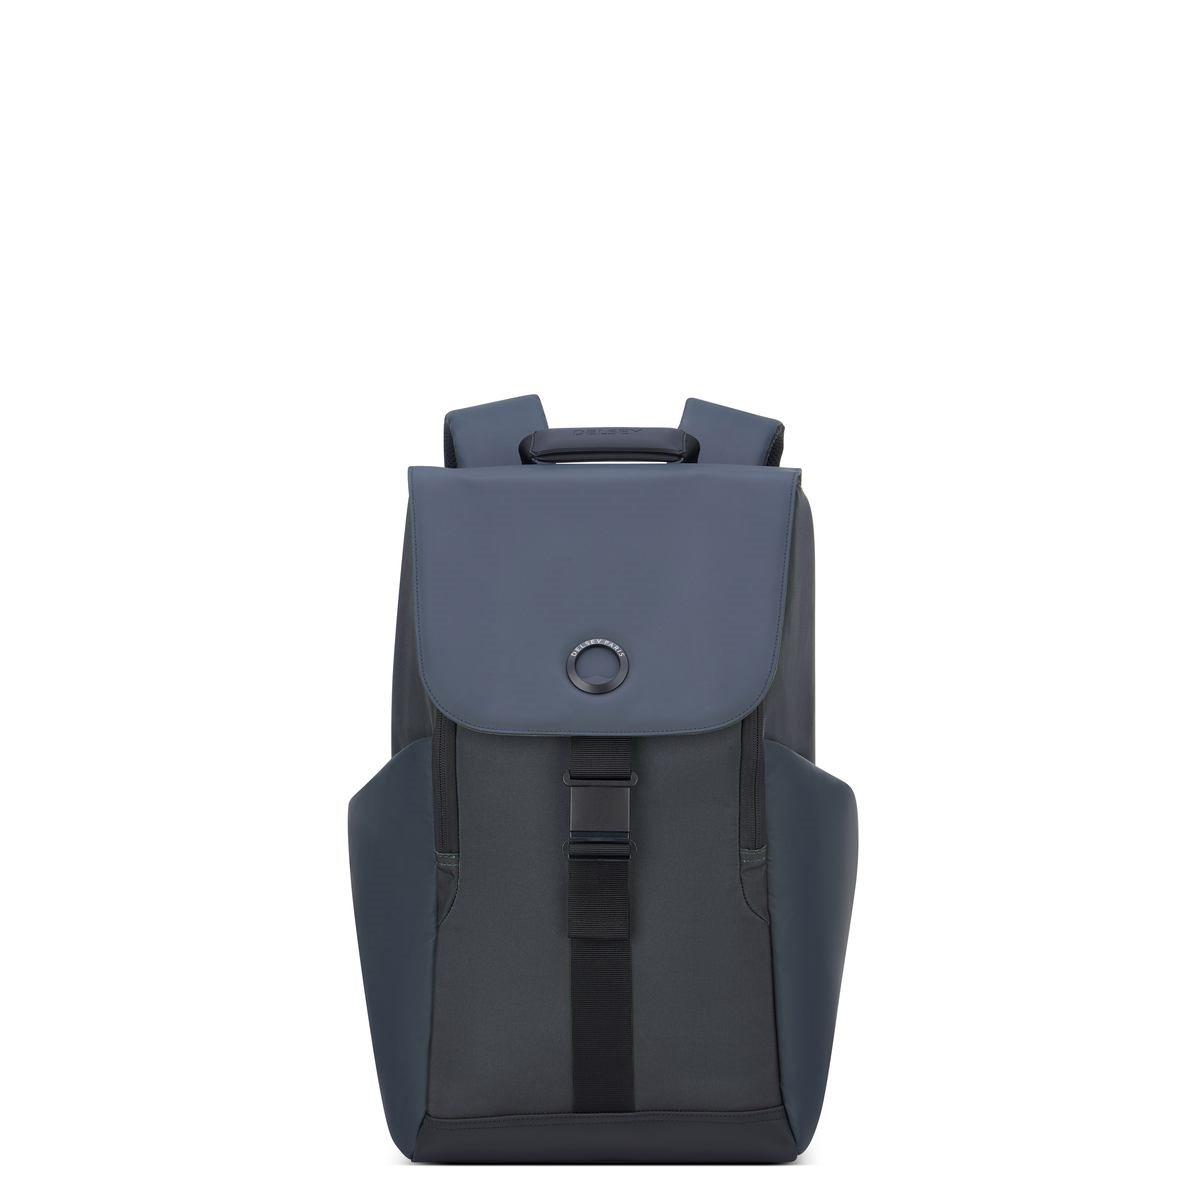 Delsey Σακίδιο πλάτης με θέση PC 15,6'' 45,5x31,5x14,5cm σειρά Securflap Black